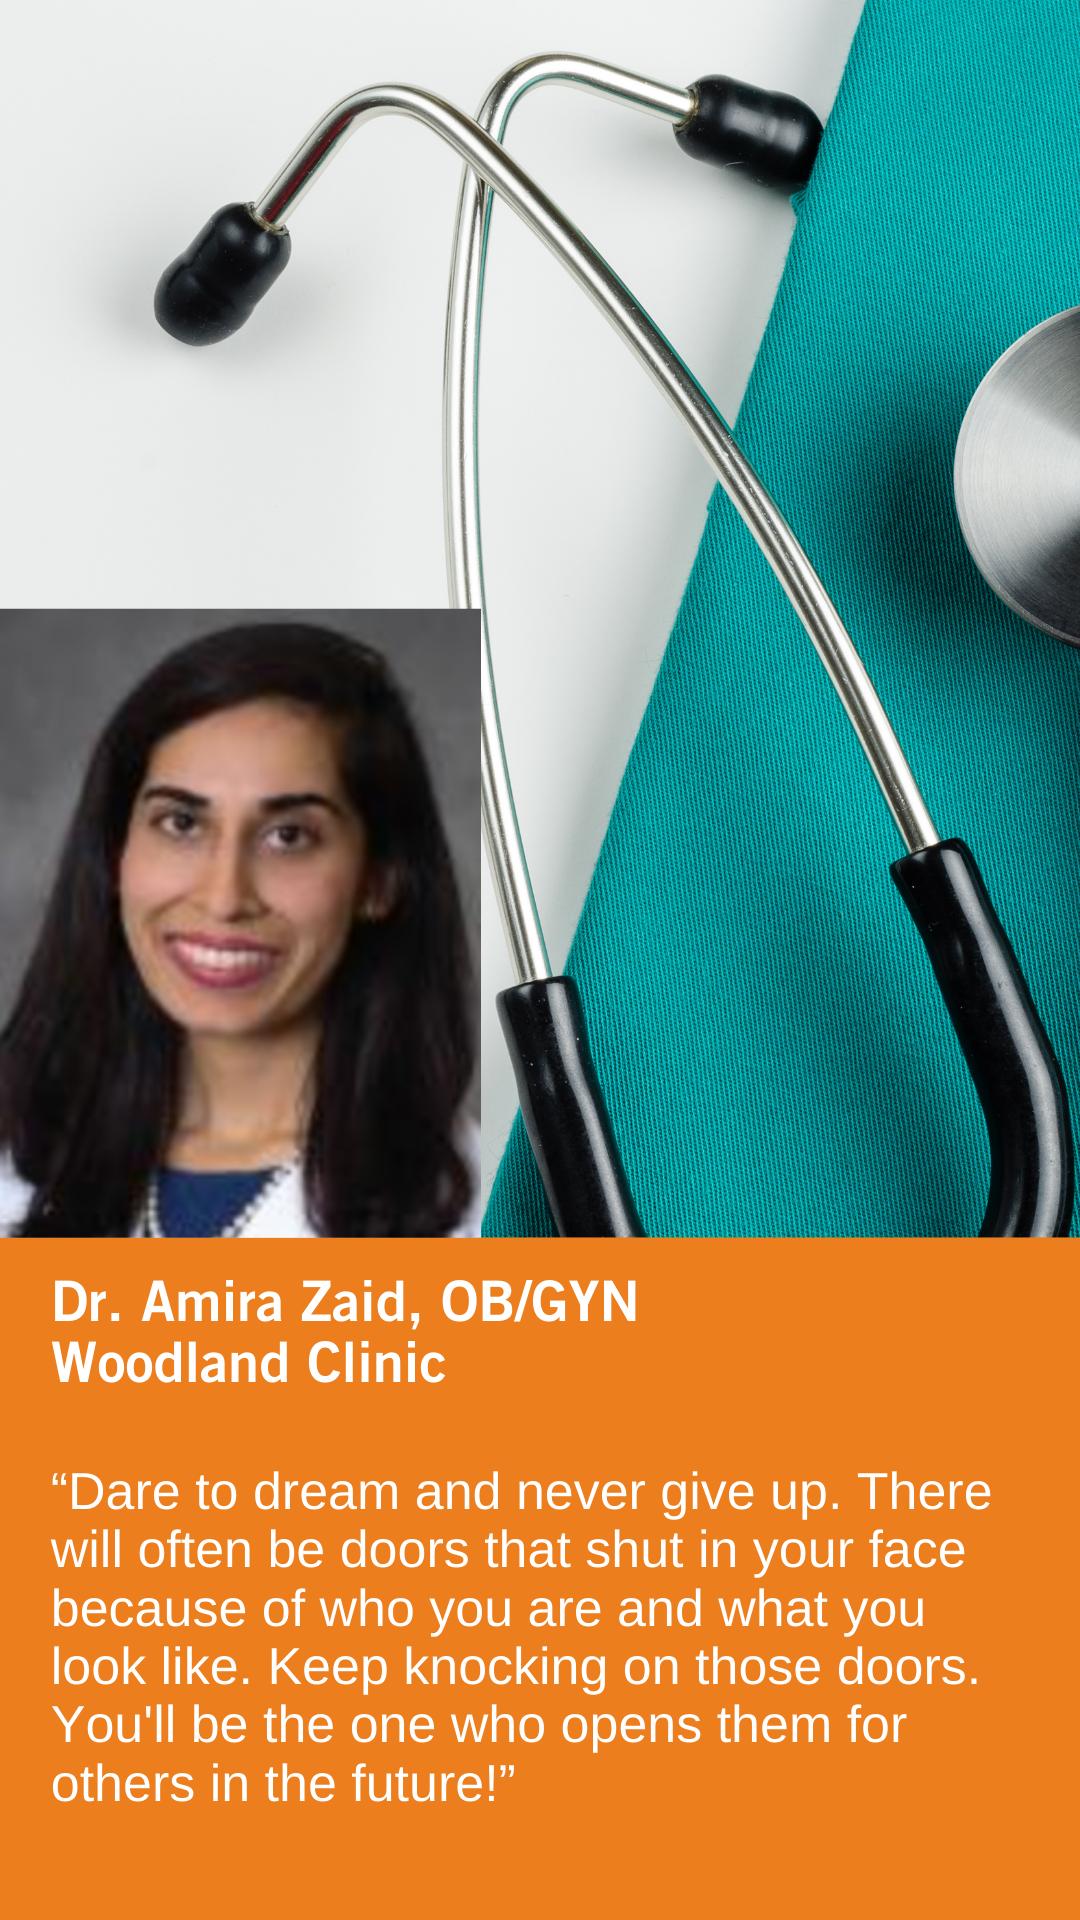 Amira Zaid, MD, Obstetrics & Gynecology, Woodland Clinic